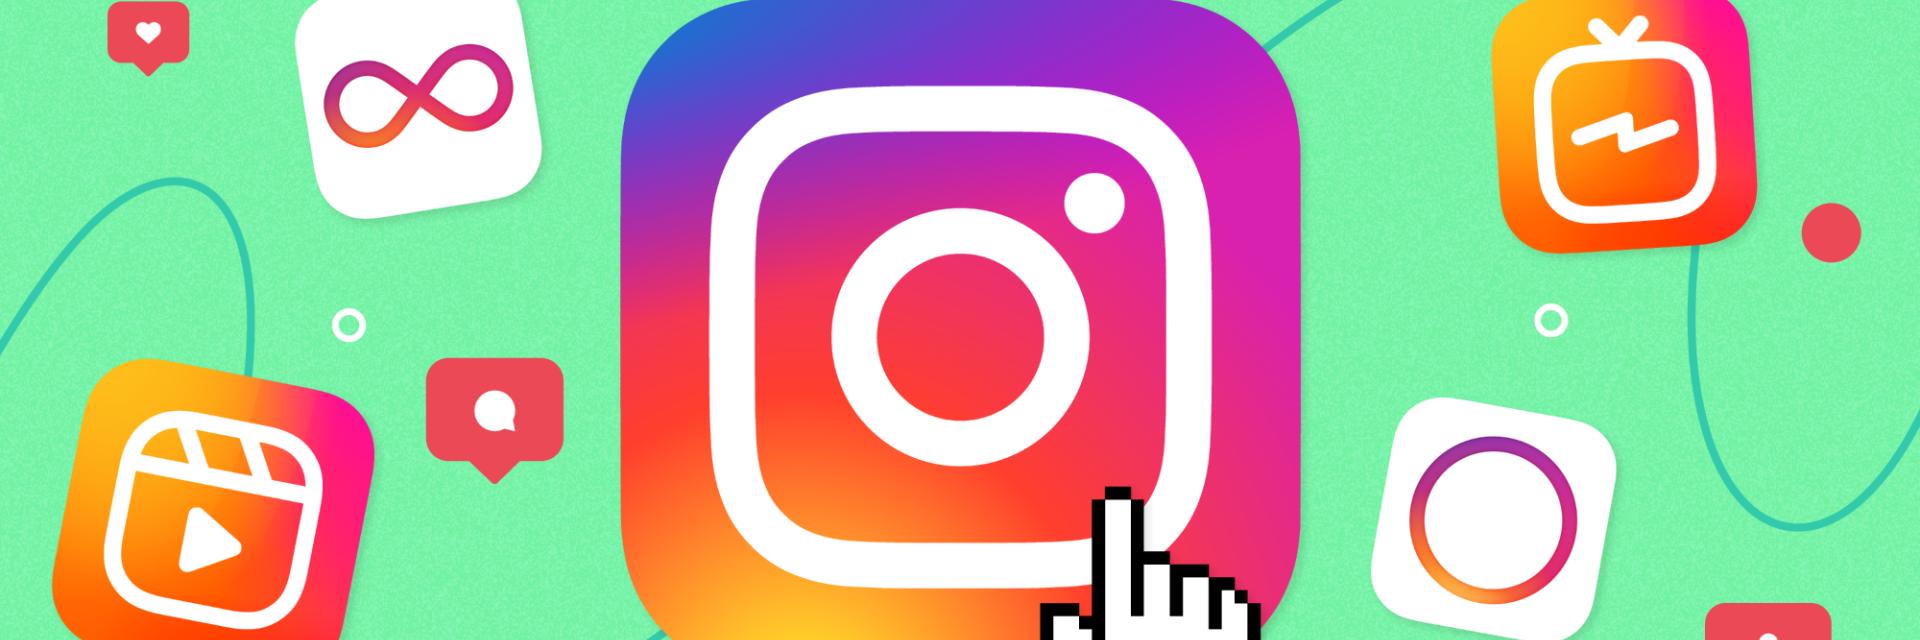 instagramapp2